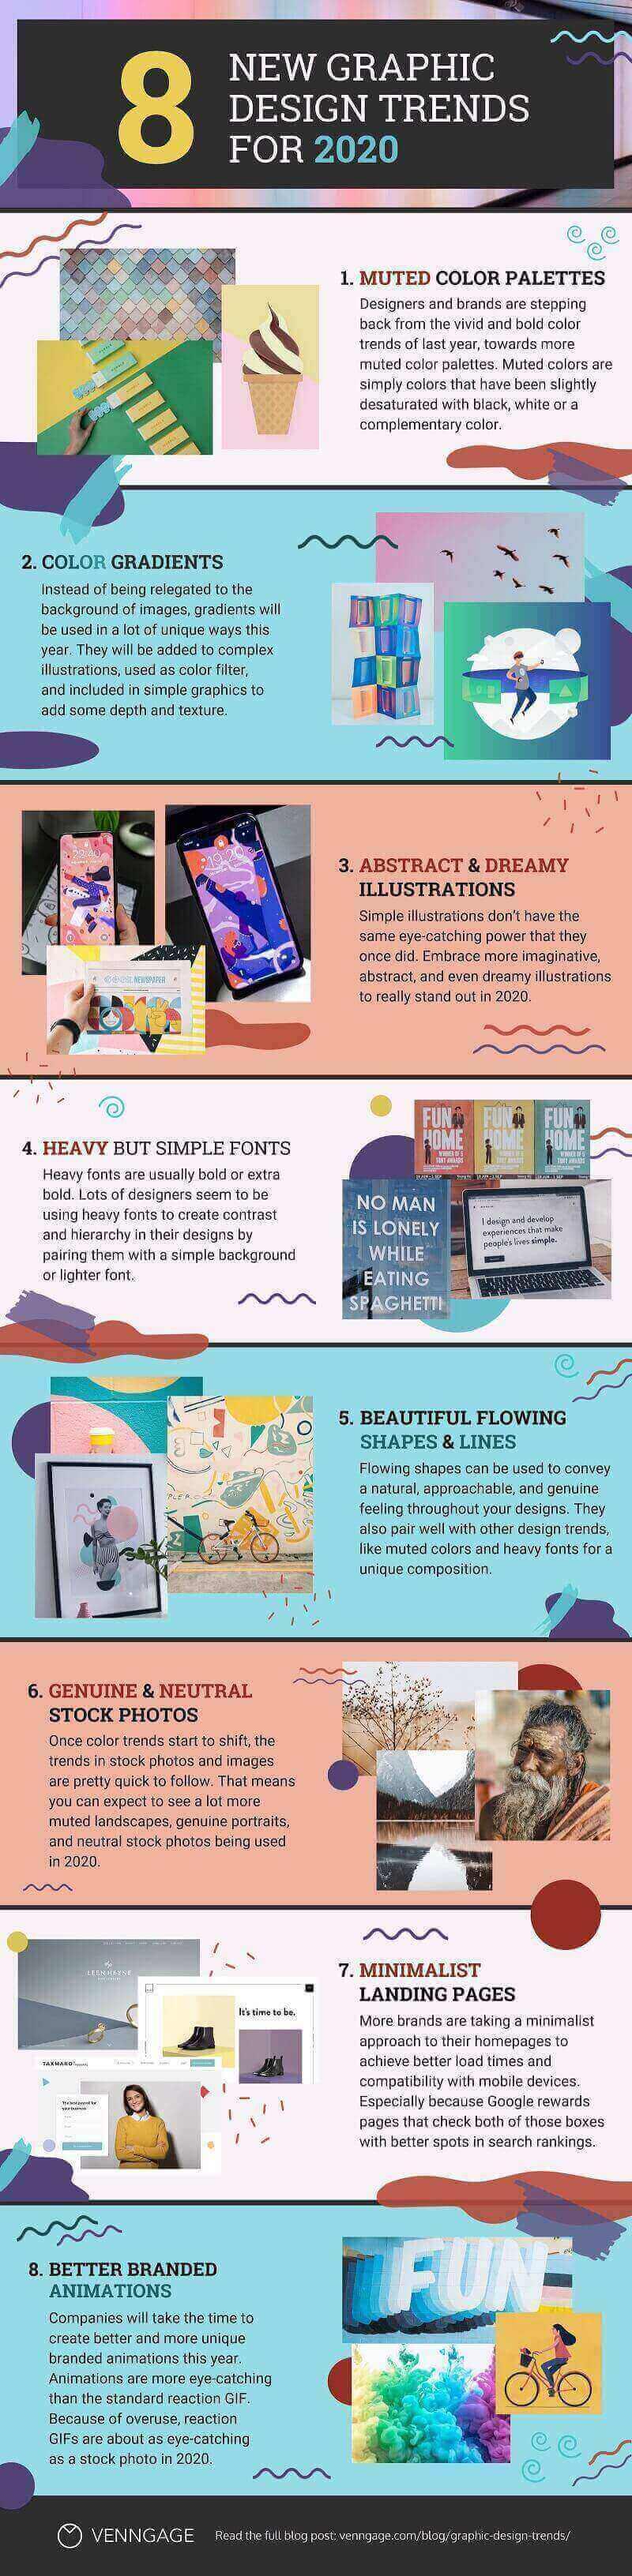 Graphic-Design-Trends-2020-Infographic-